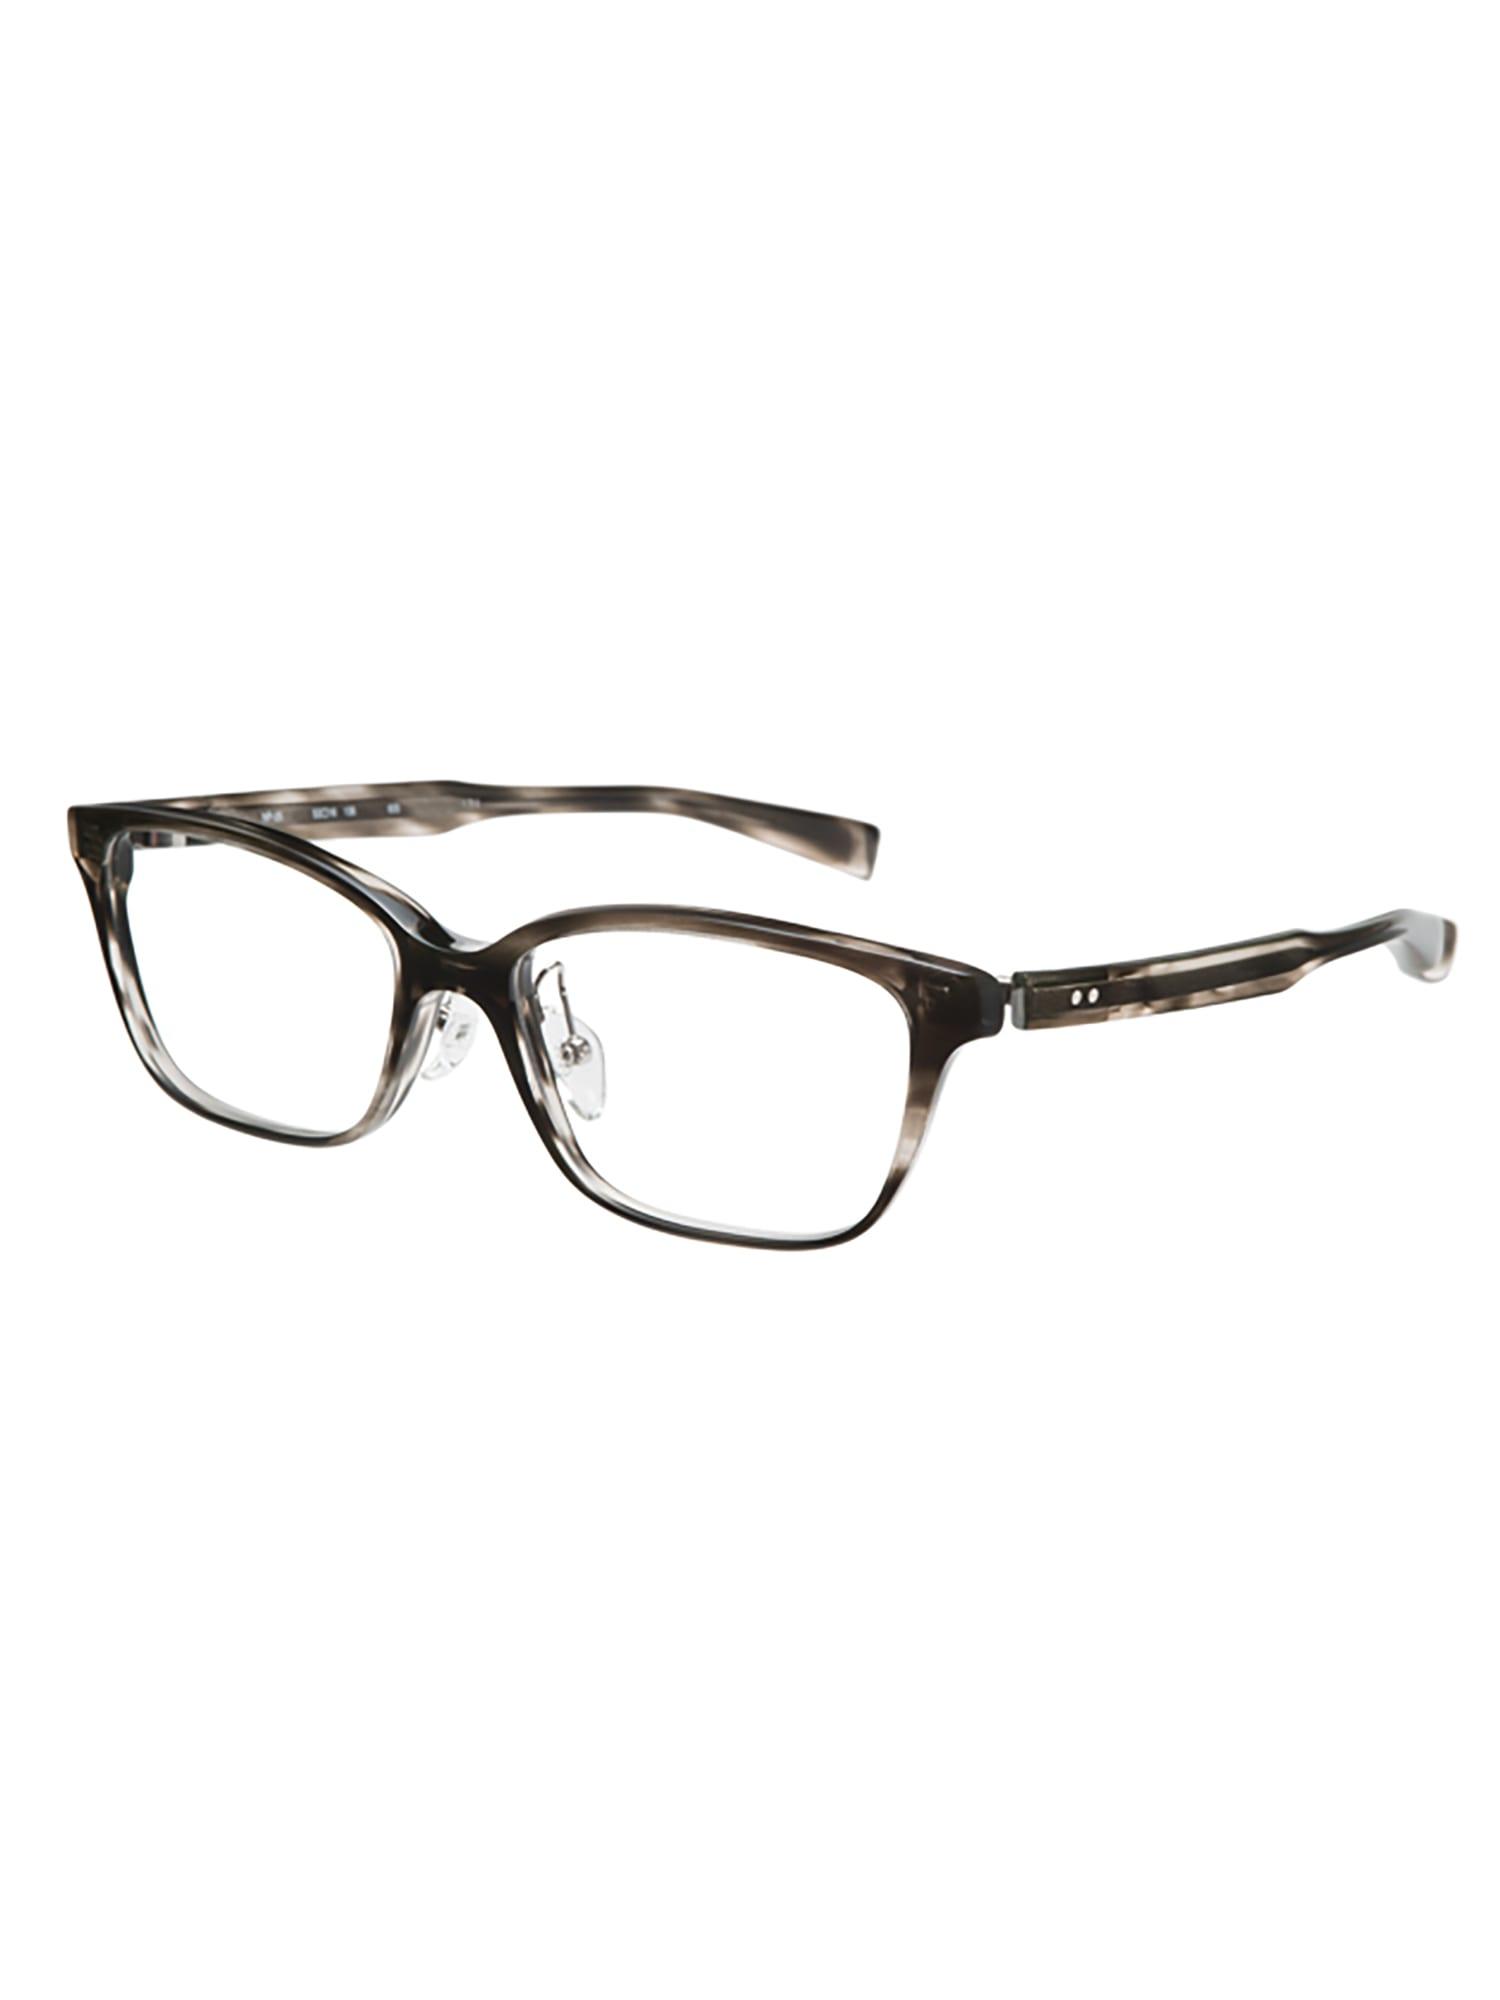 999.9 N/25 Eyewear